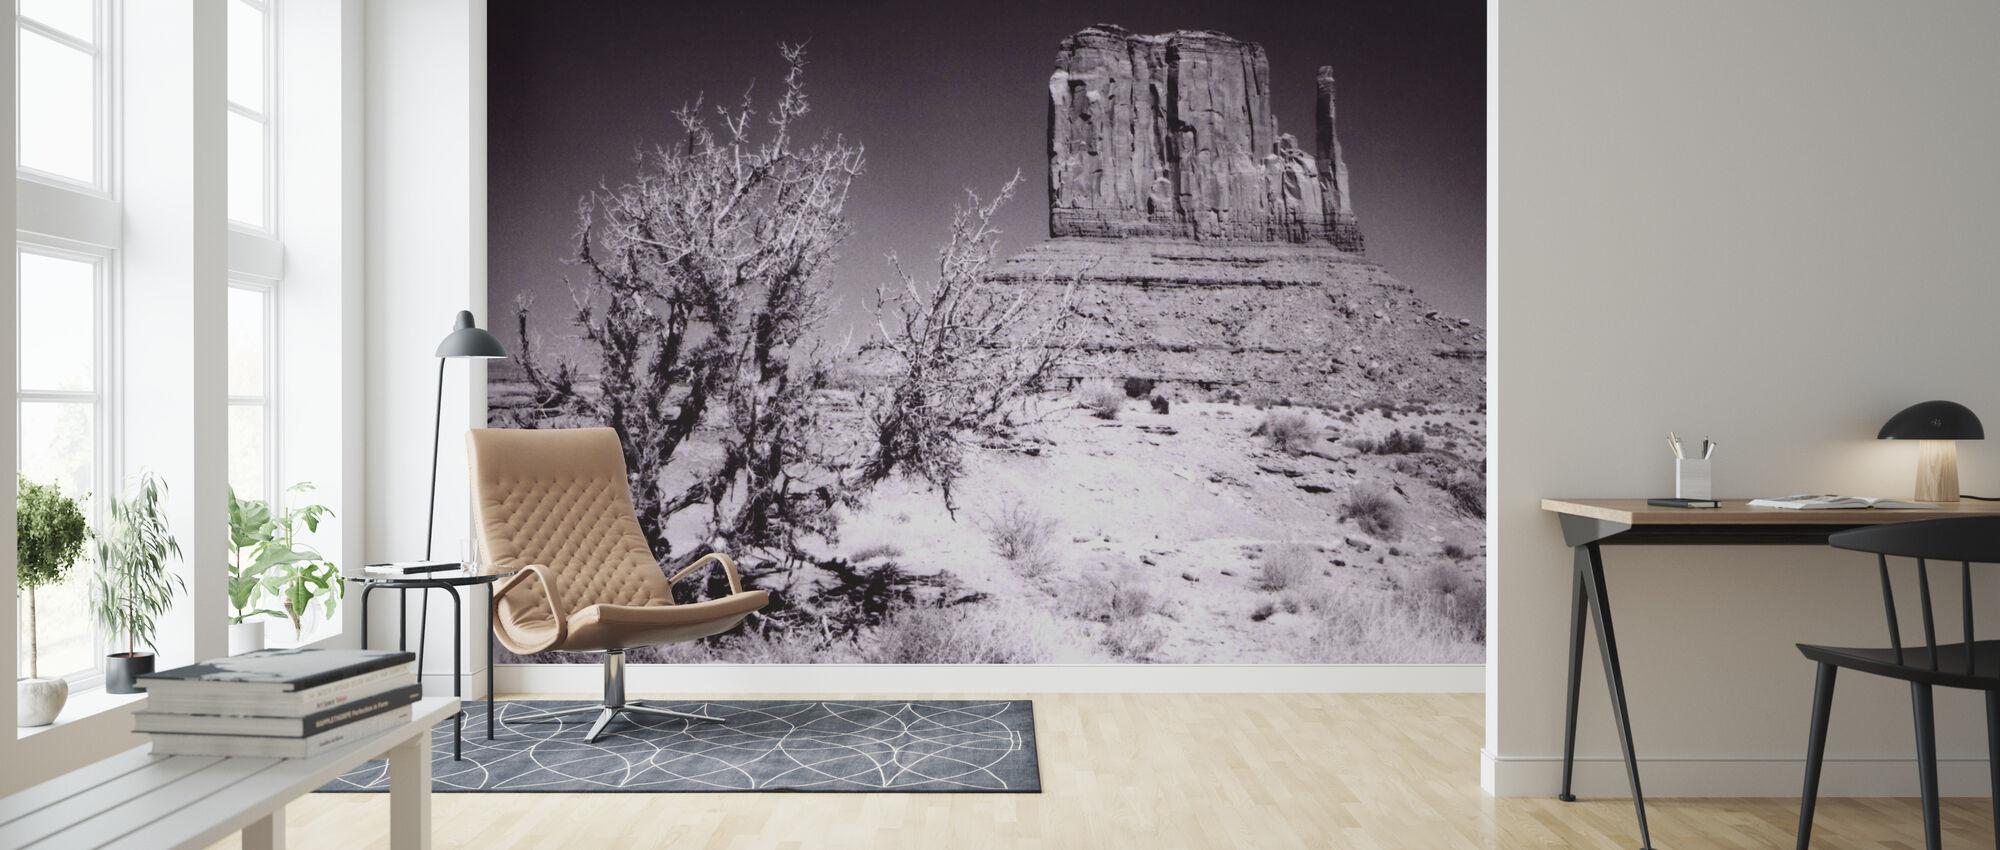 Monument Valley, Utah, USA - Tapete - Wohnzimmer